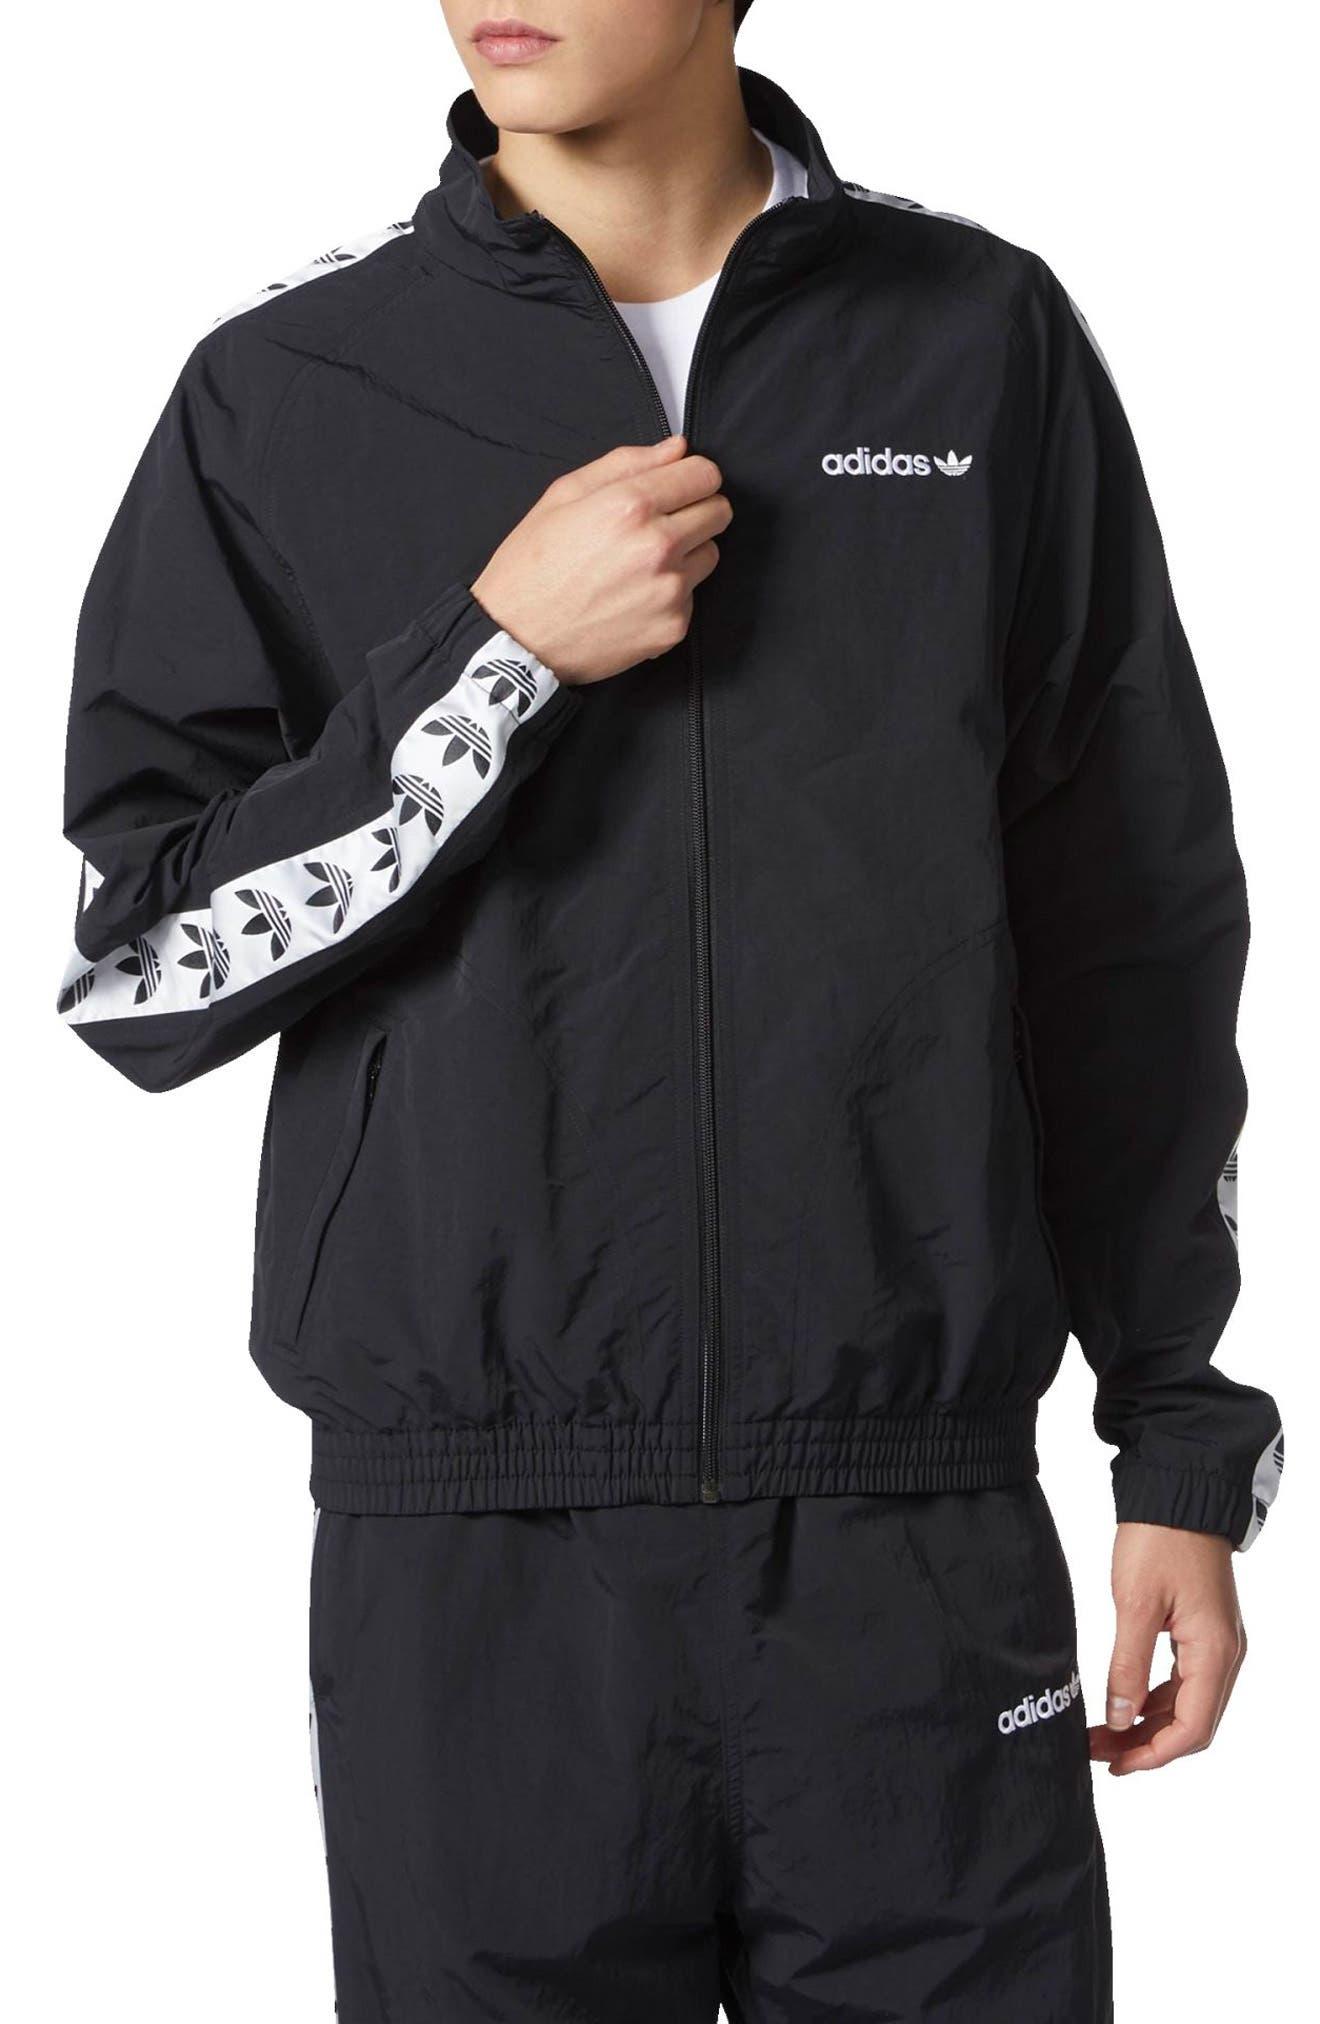 TNT Tape Wind Jacket,                         Main,                         color, Black/ White